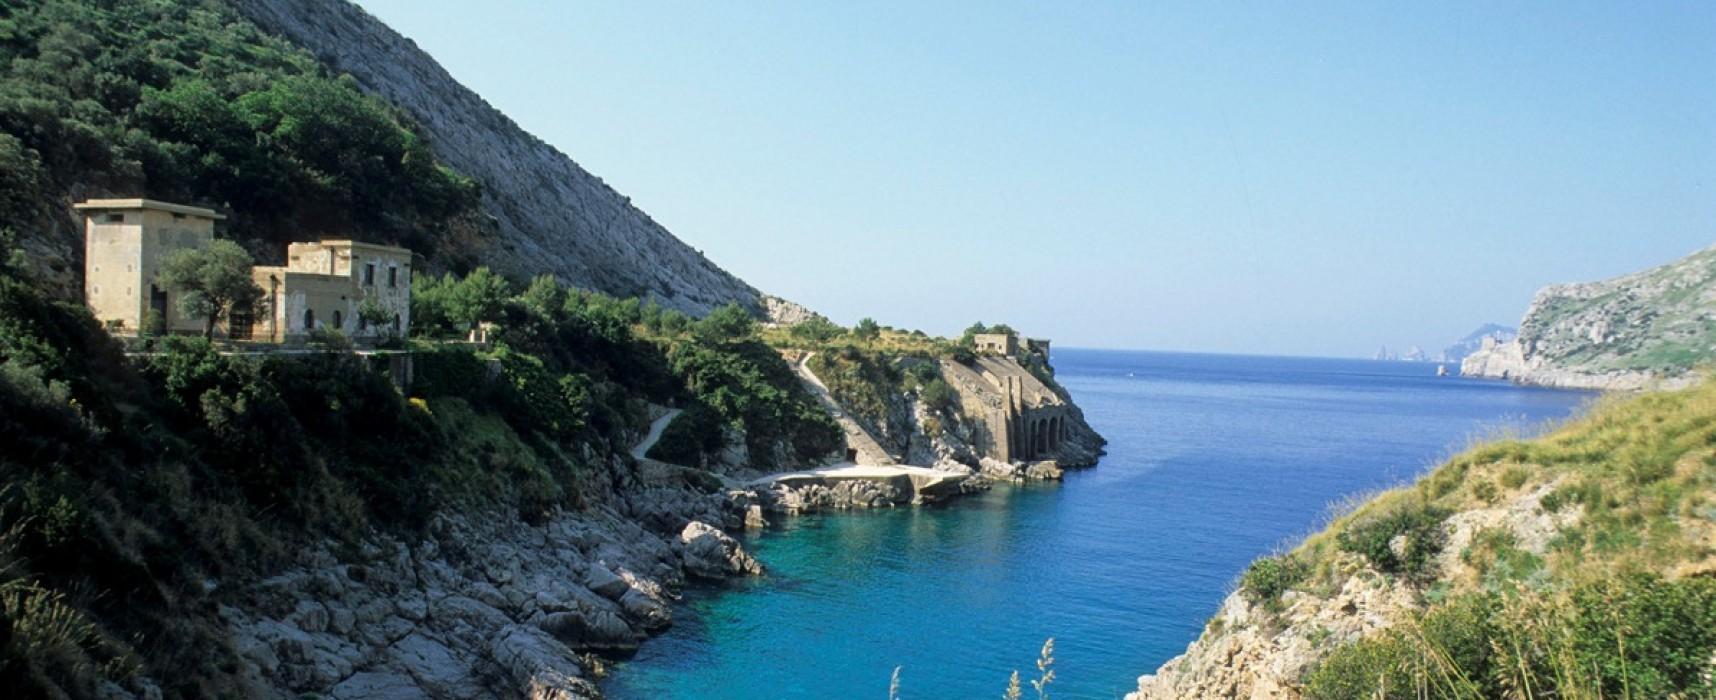 Turismo, boom itinerari naturali